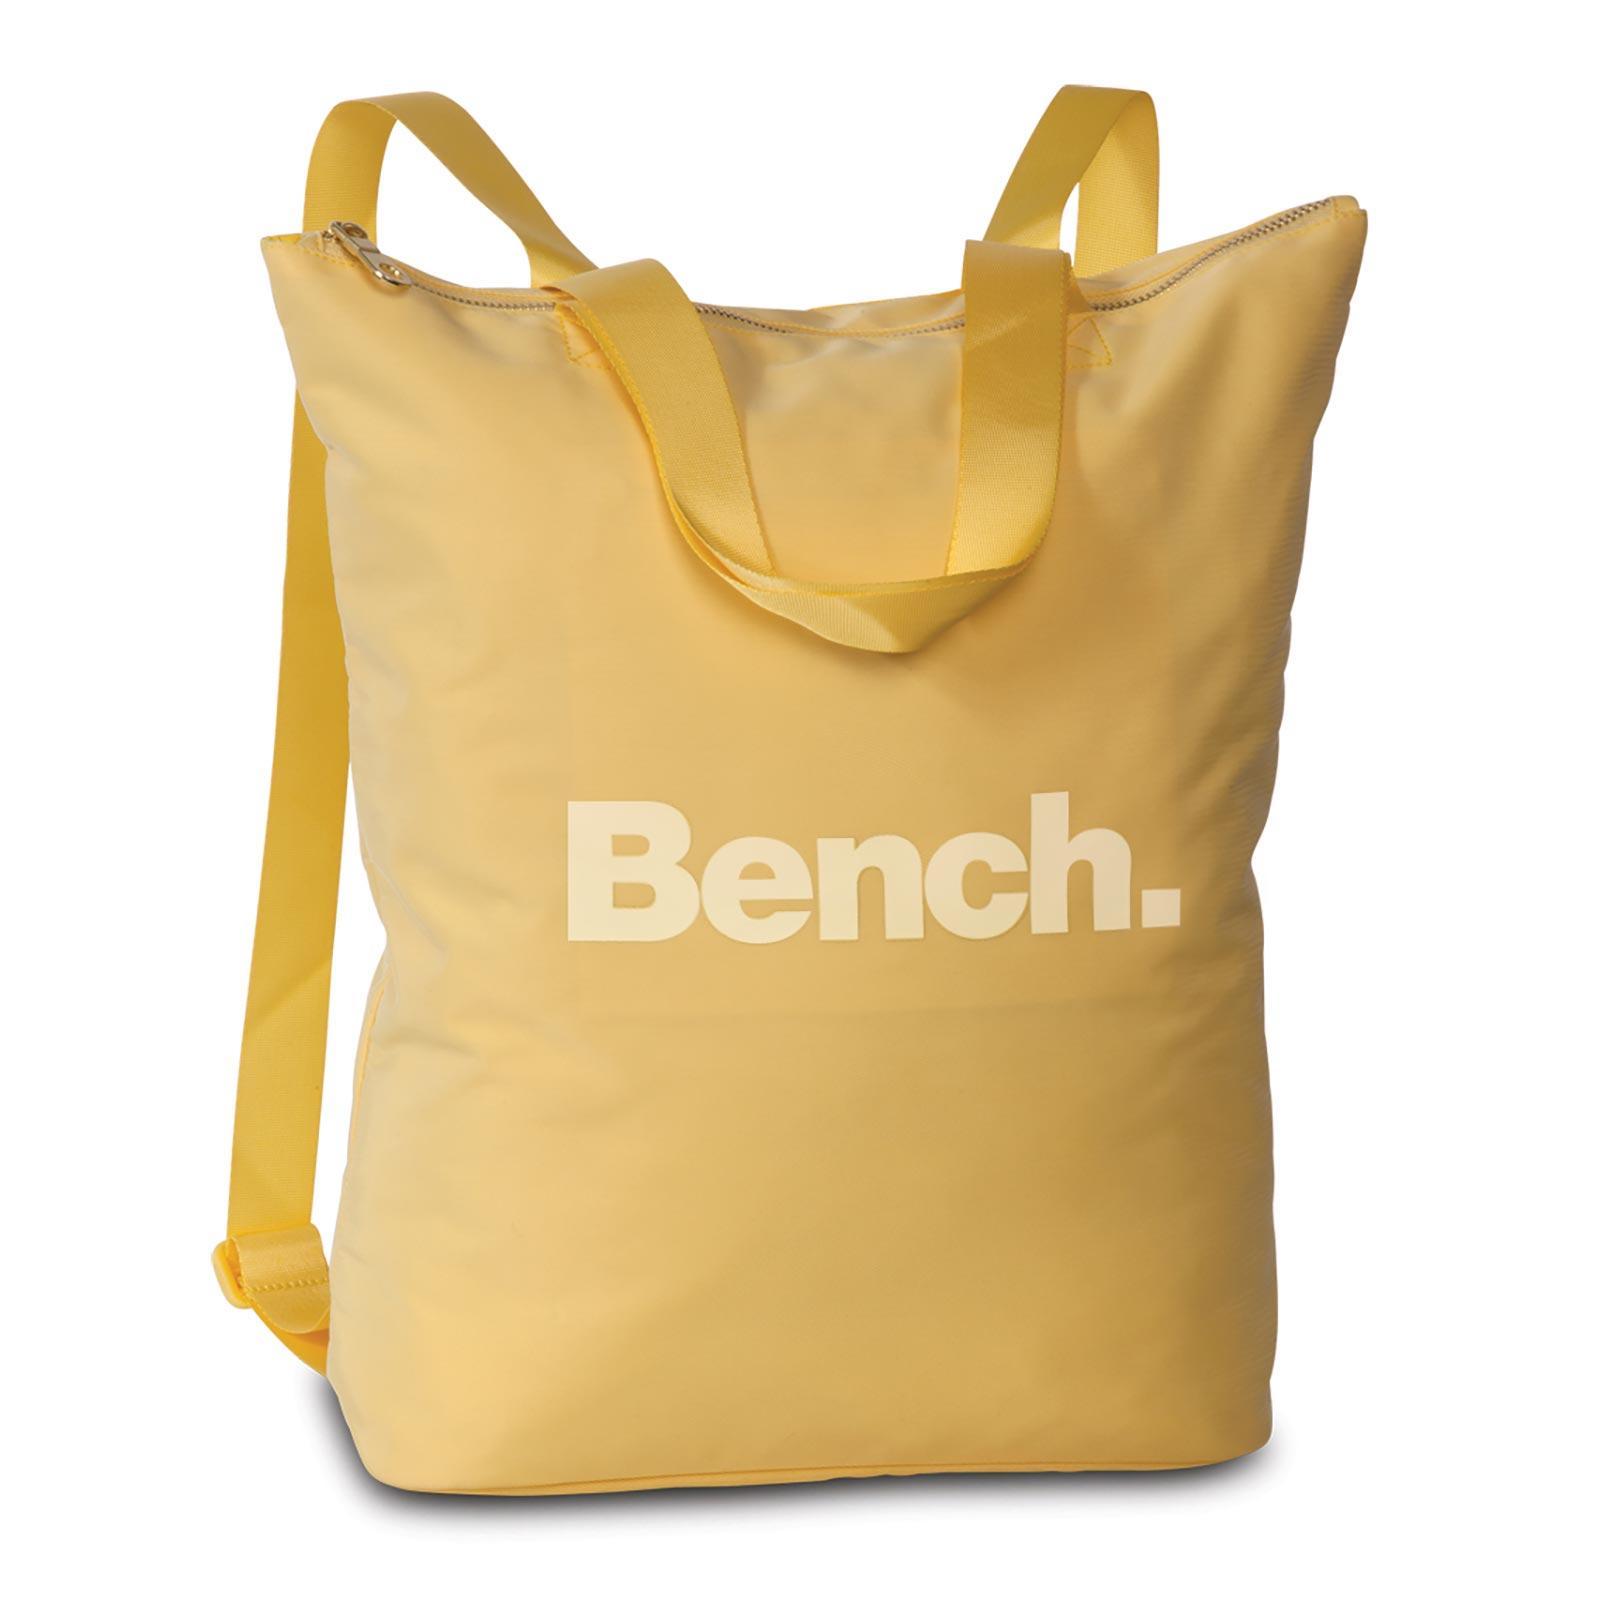 Bench City Girls Rucksack 40 cm - Gelb 64160-1000